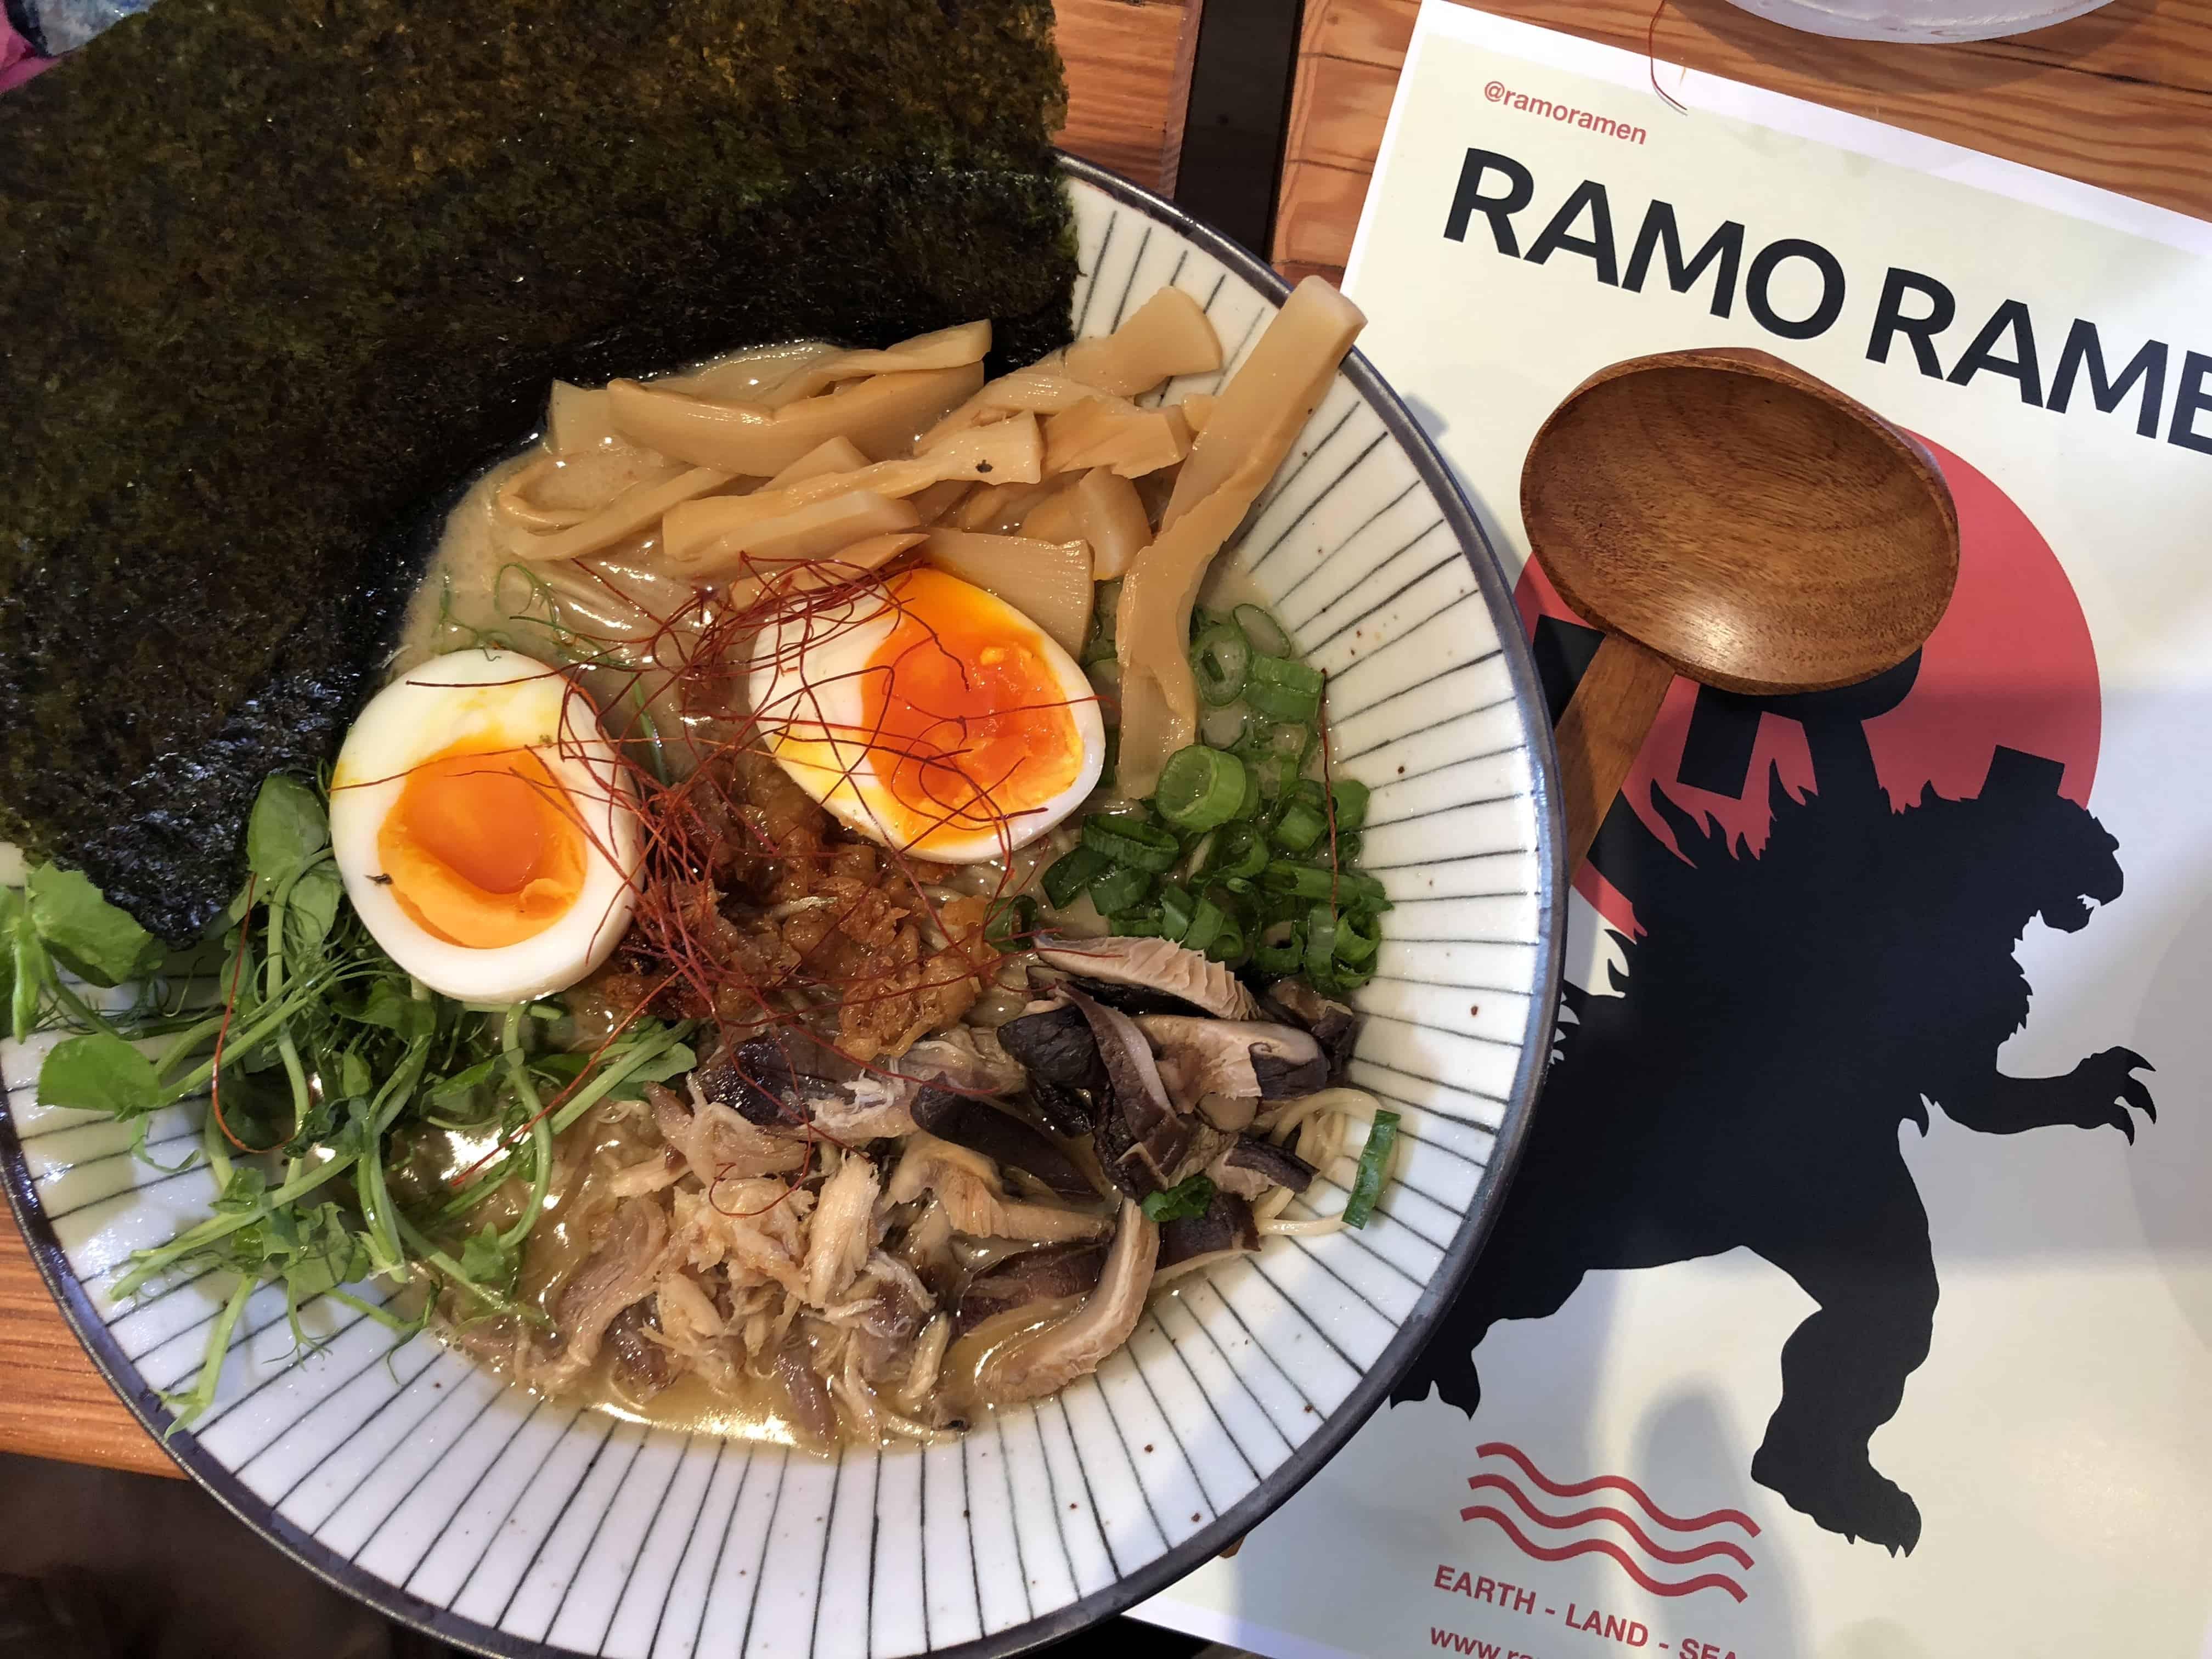 Ramo Ramen - Halal Girl About Town